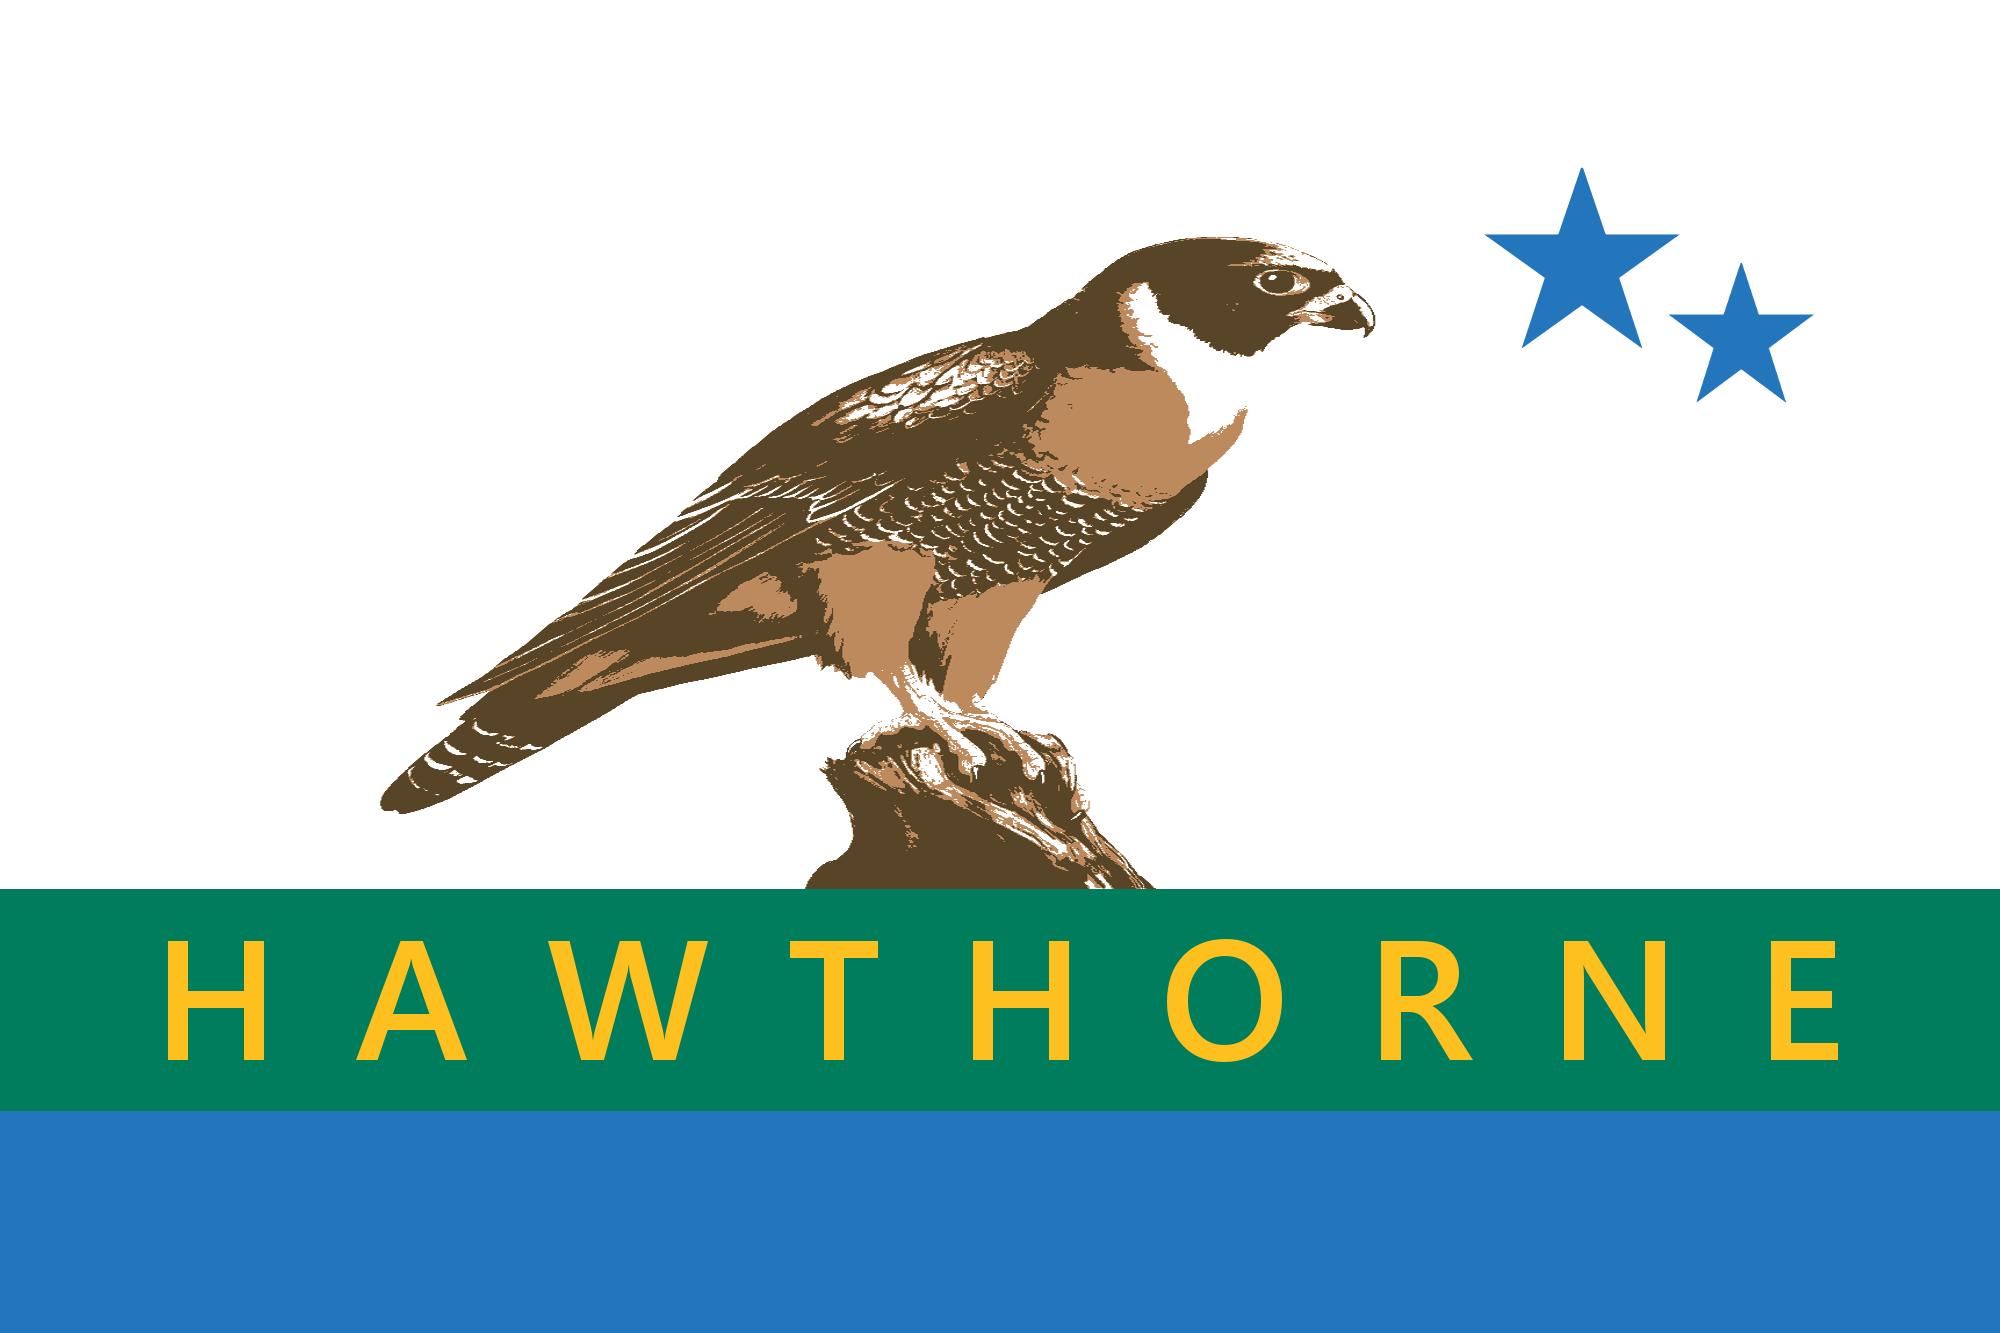 Country data Hawthorne